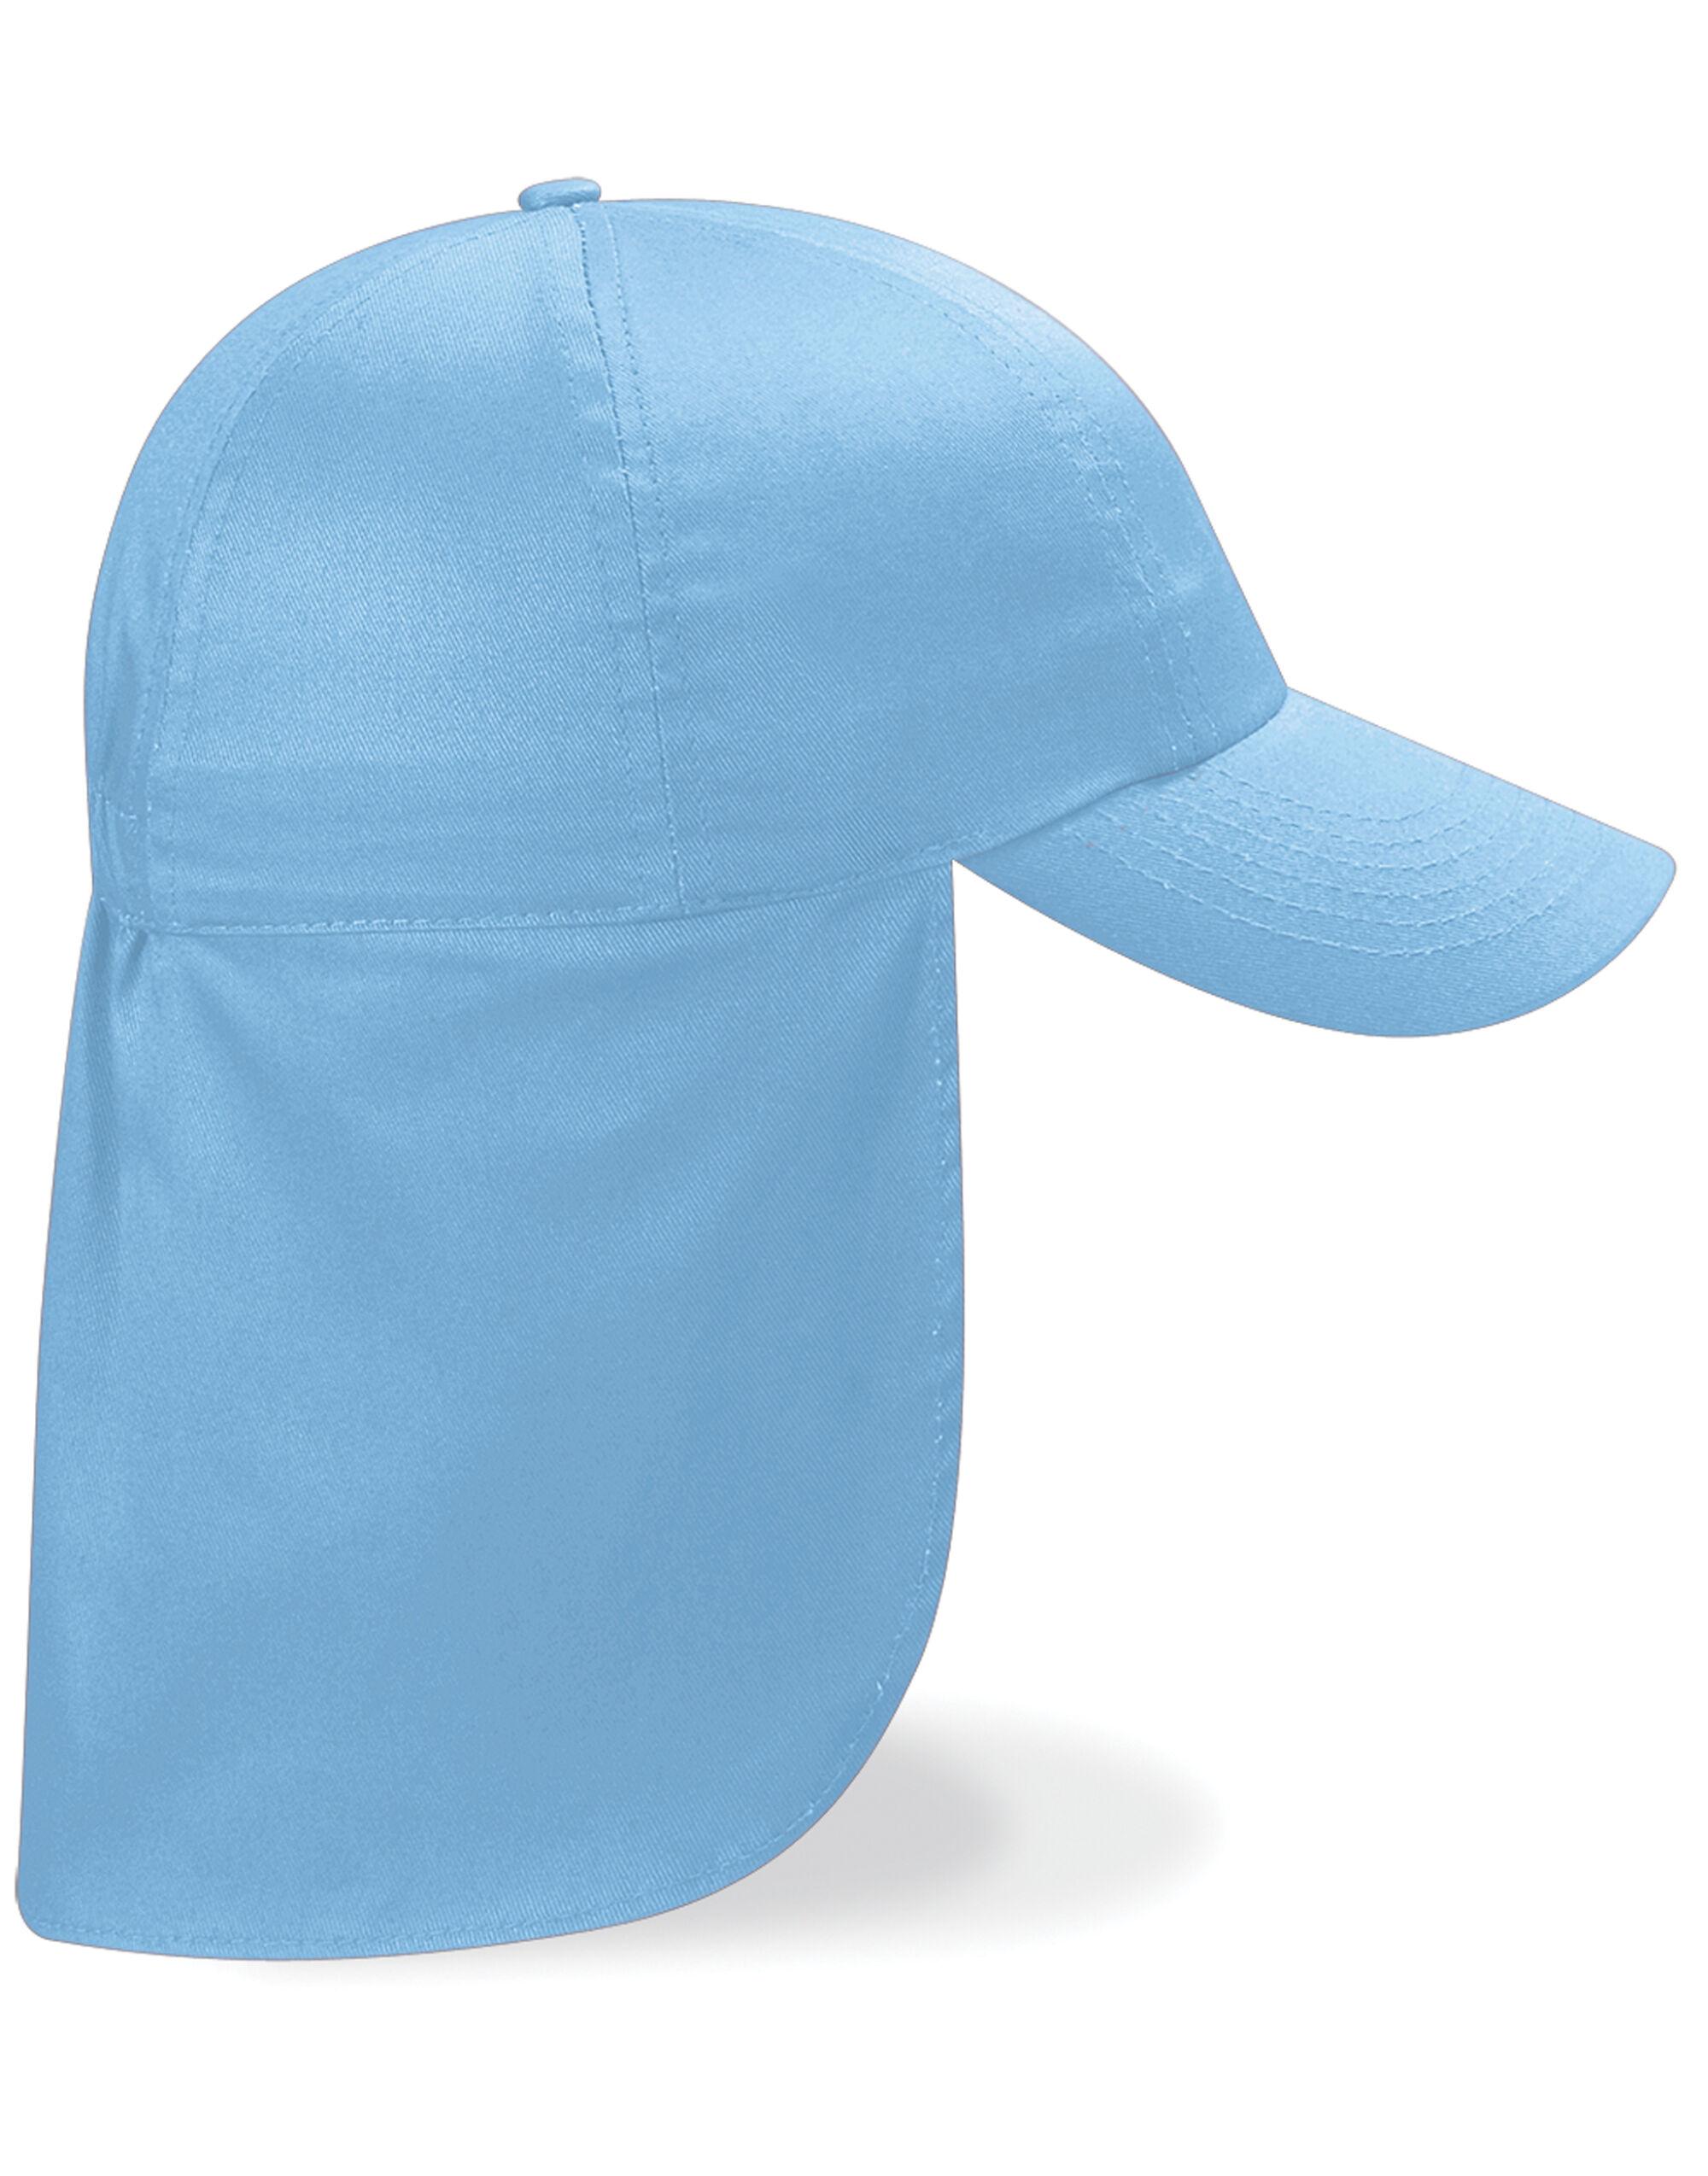 Beechfield Junior Legionnaire Style Cap Caps /& Hats Etc All Sizes and Colours